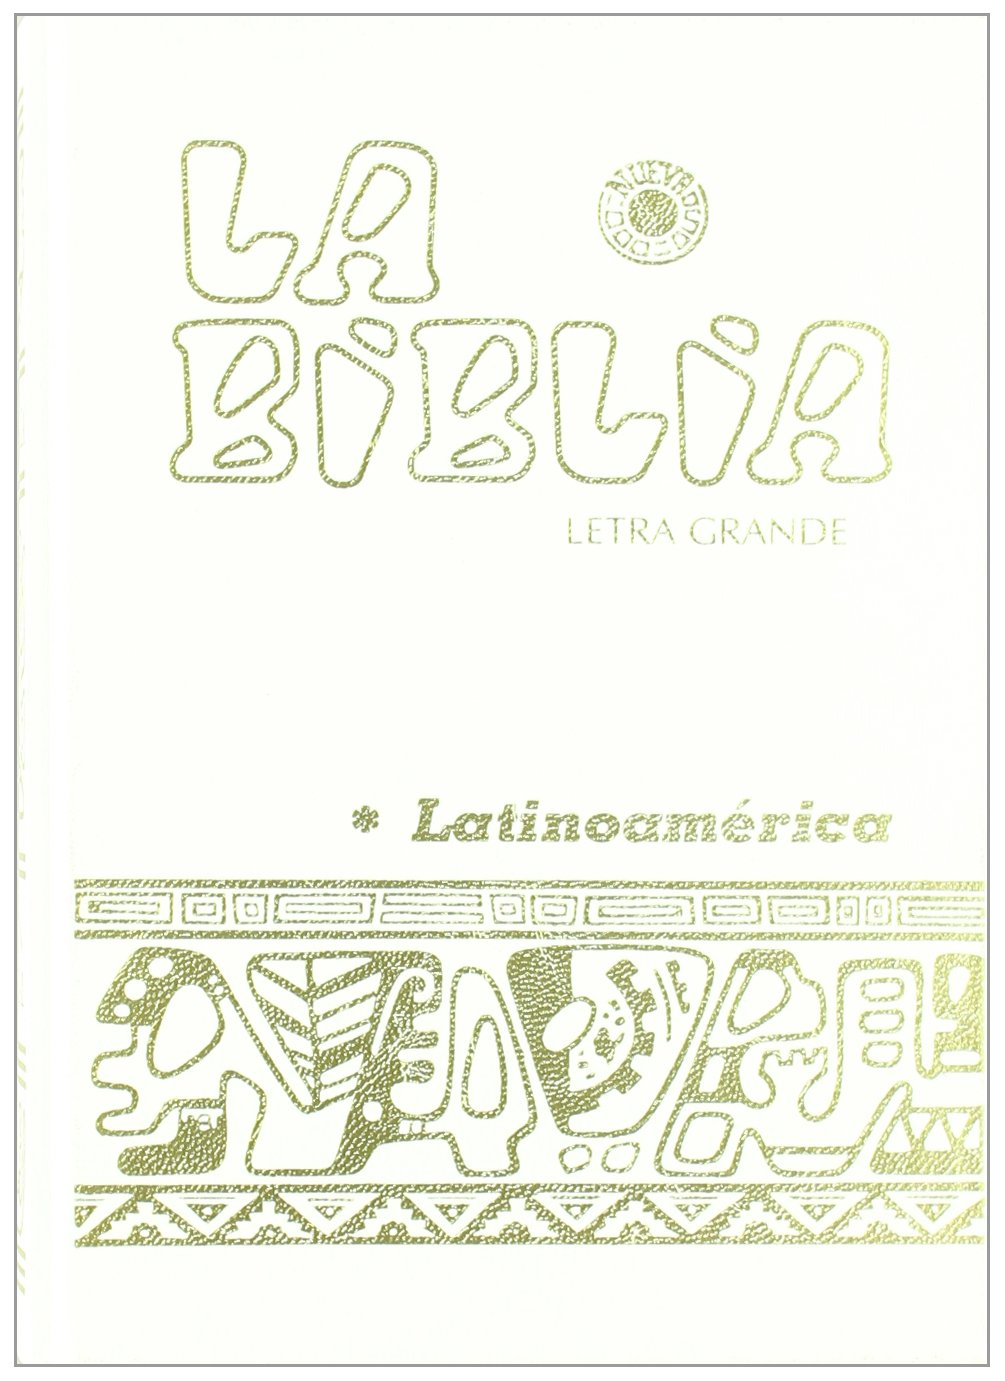 La Biblia Latinoamericana, la (Biblia Latinoamérica)